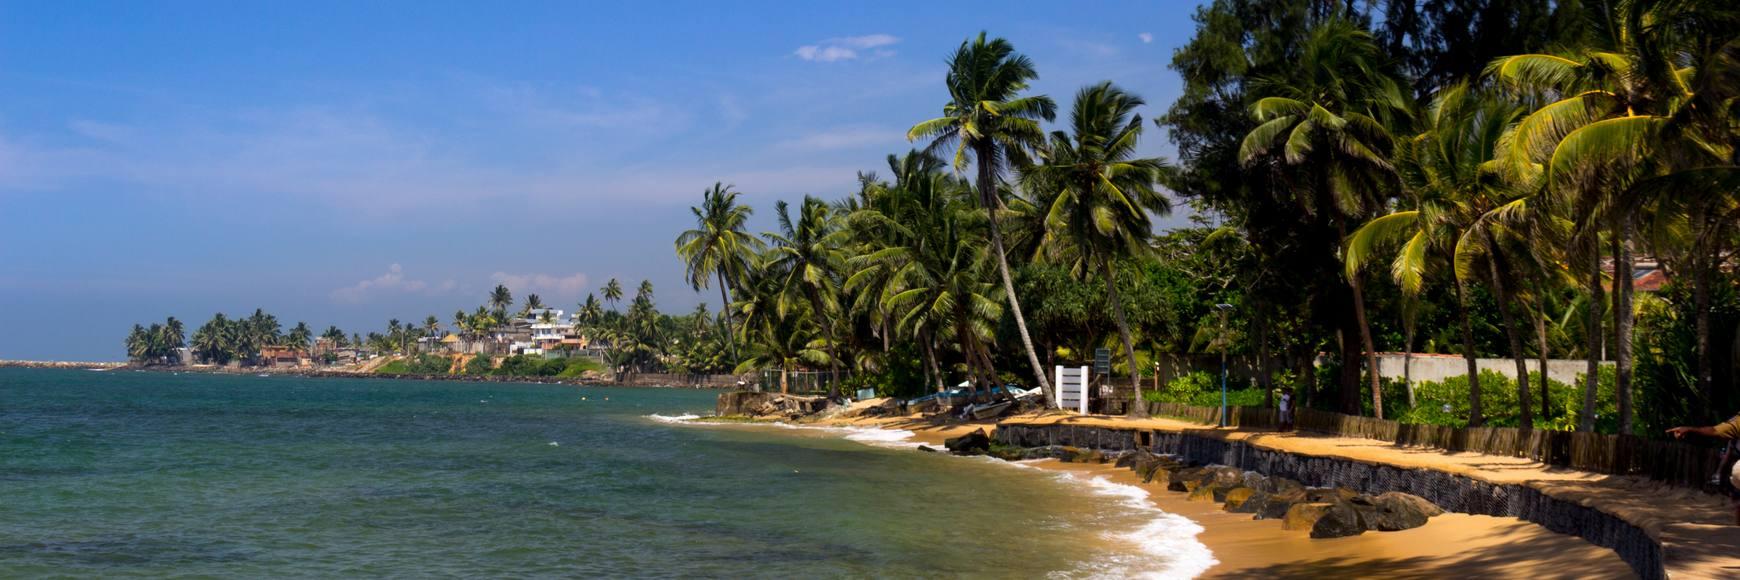 Location bateau moteur Sri Lanka